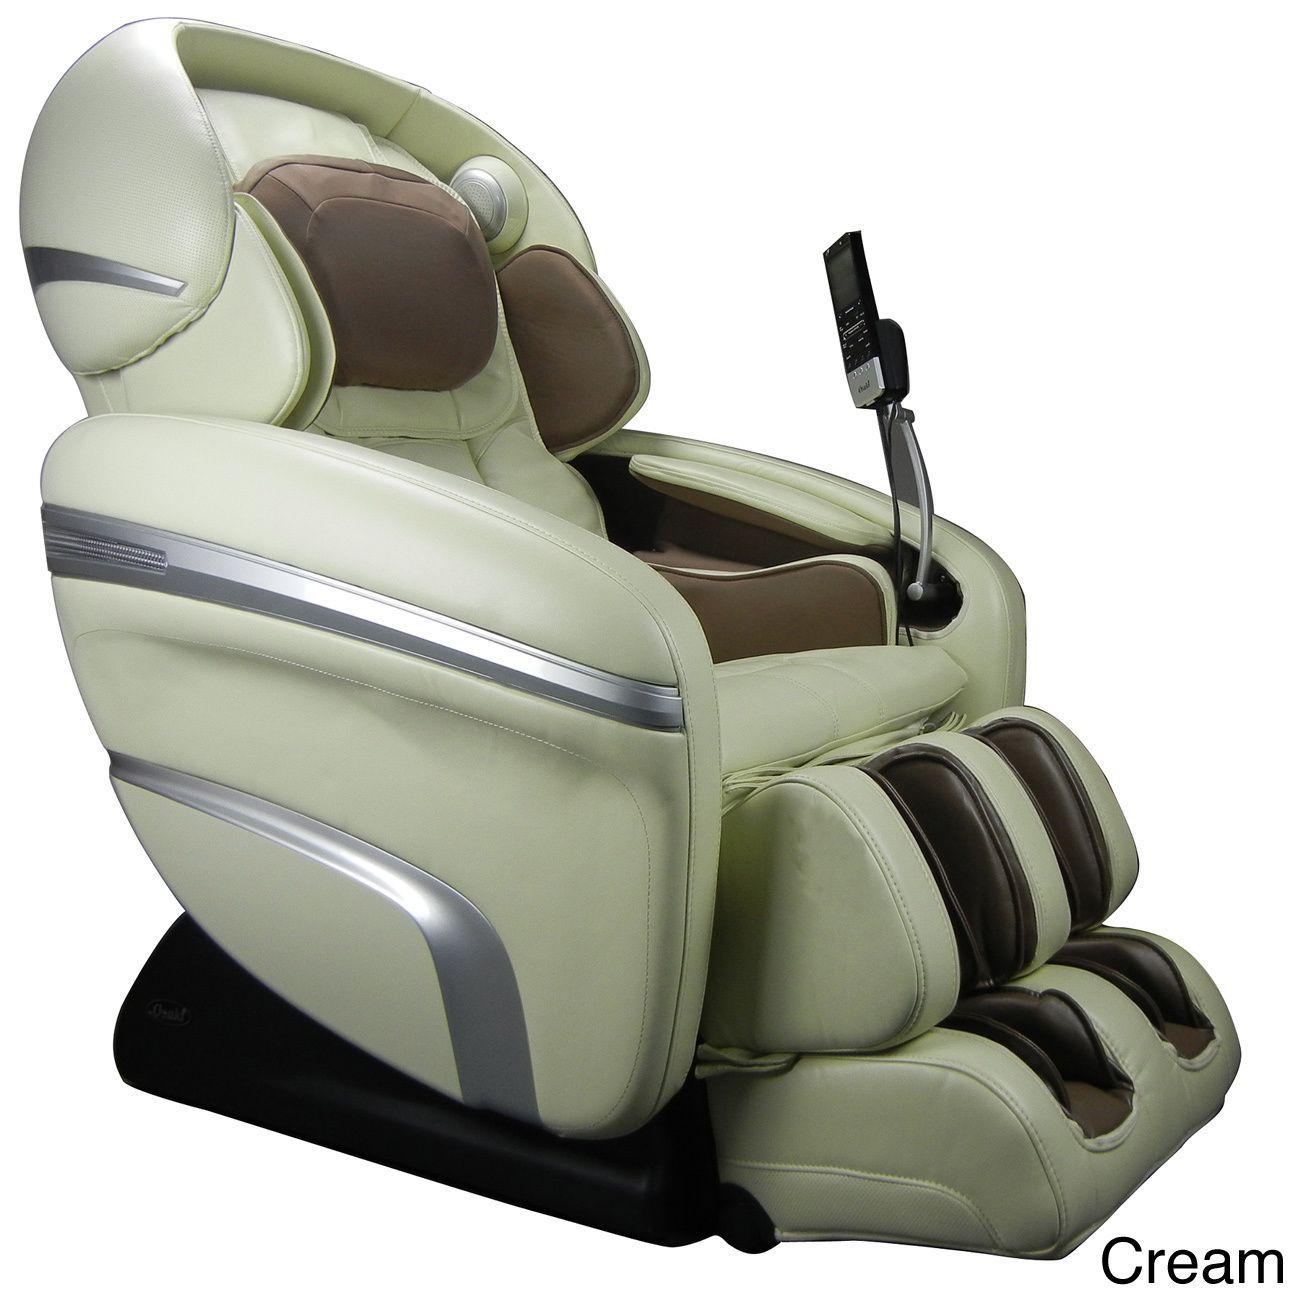 Osaki Os 7200cr Massage Chair Cream Ivory Faux Leather Massage Chair Feet Roller Hip Massage